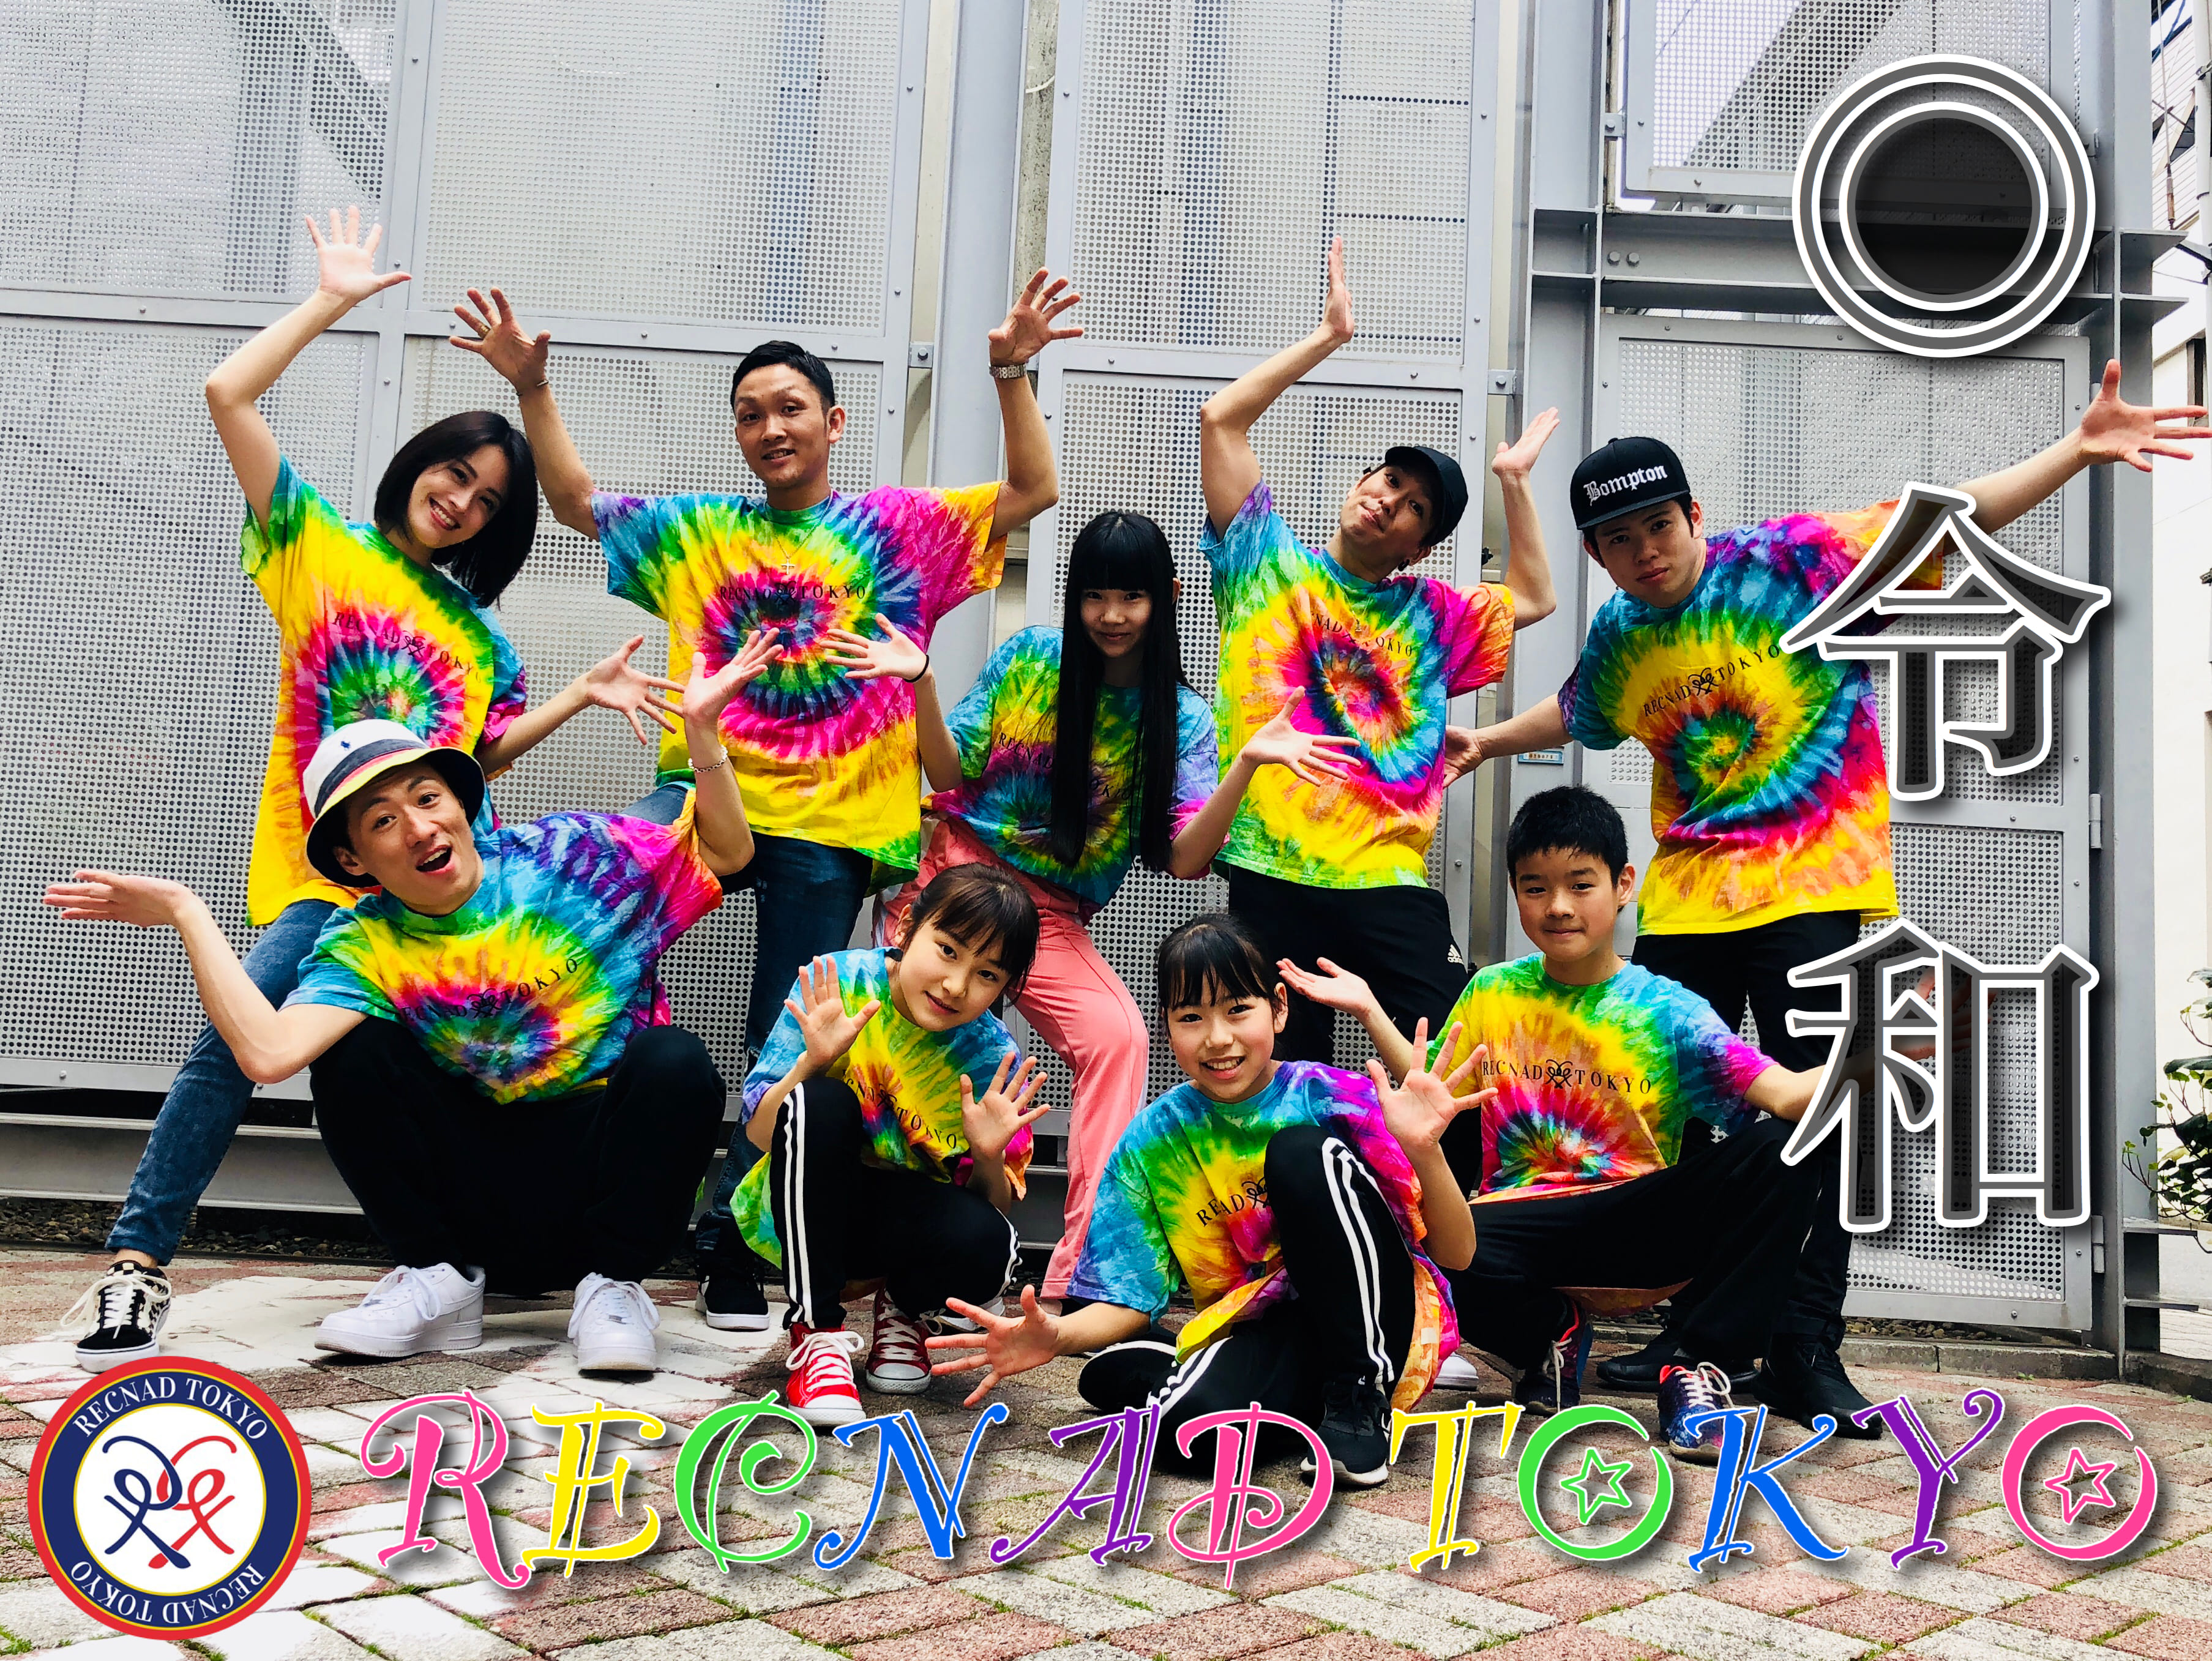 RECNAD TOKYO 出演情報 D.P dance studio 第1回目の発表会 Dear Like